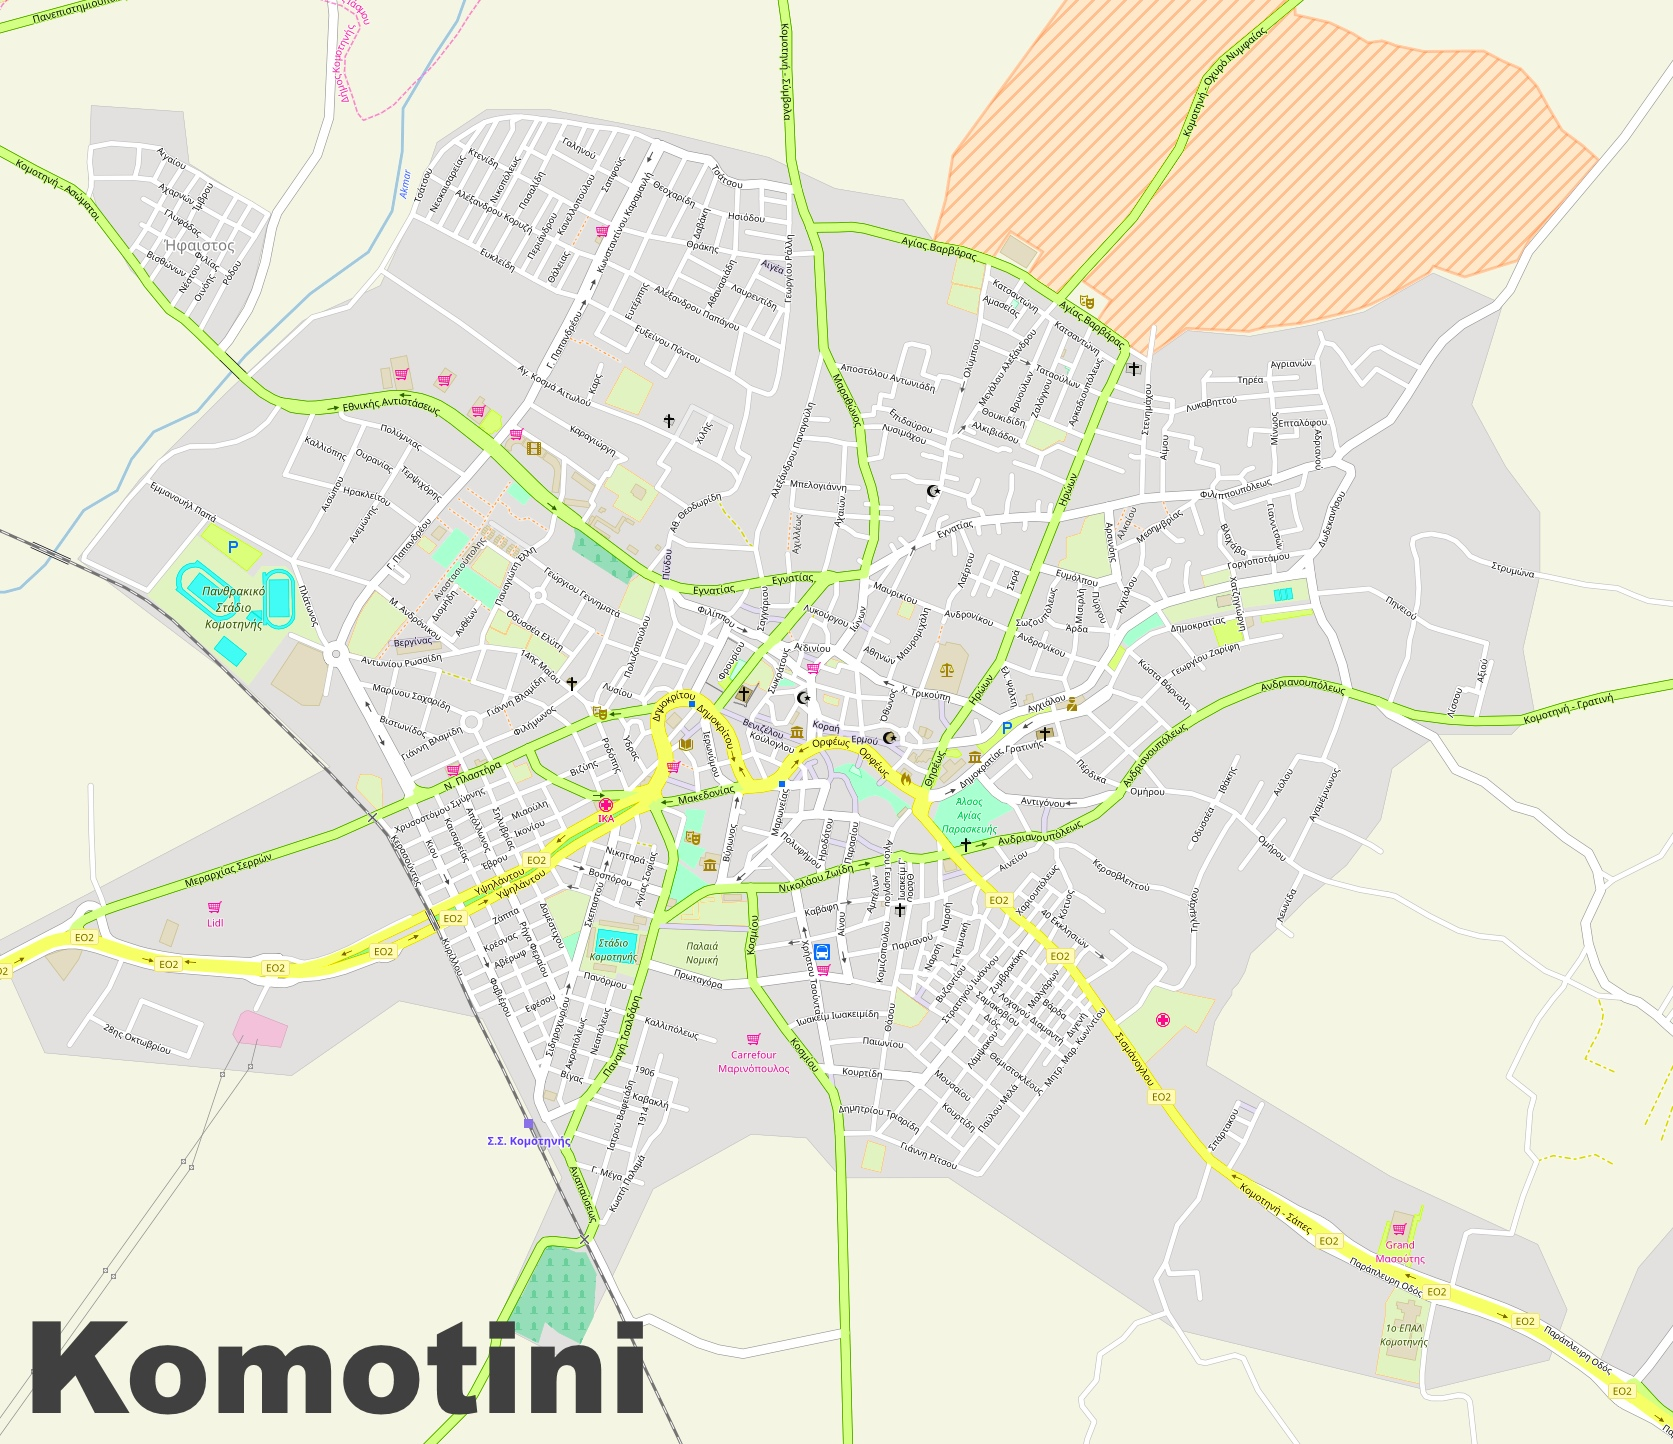 Komotini Maps Greece Maps of Komotini